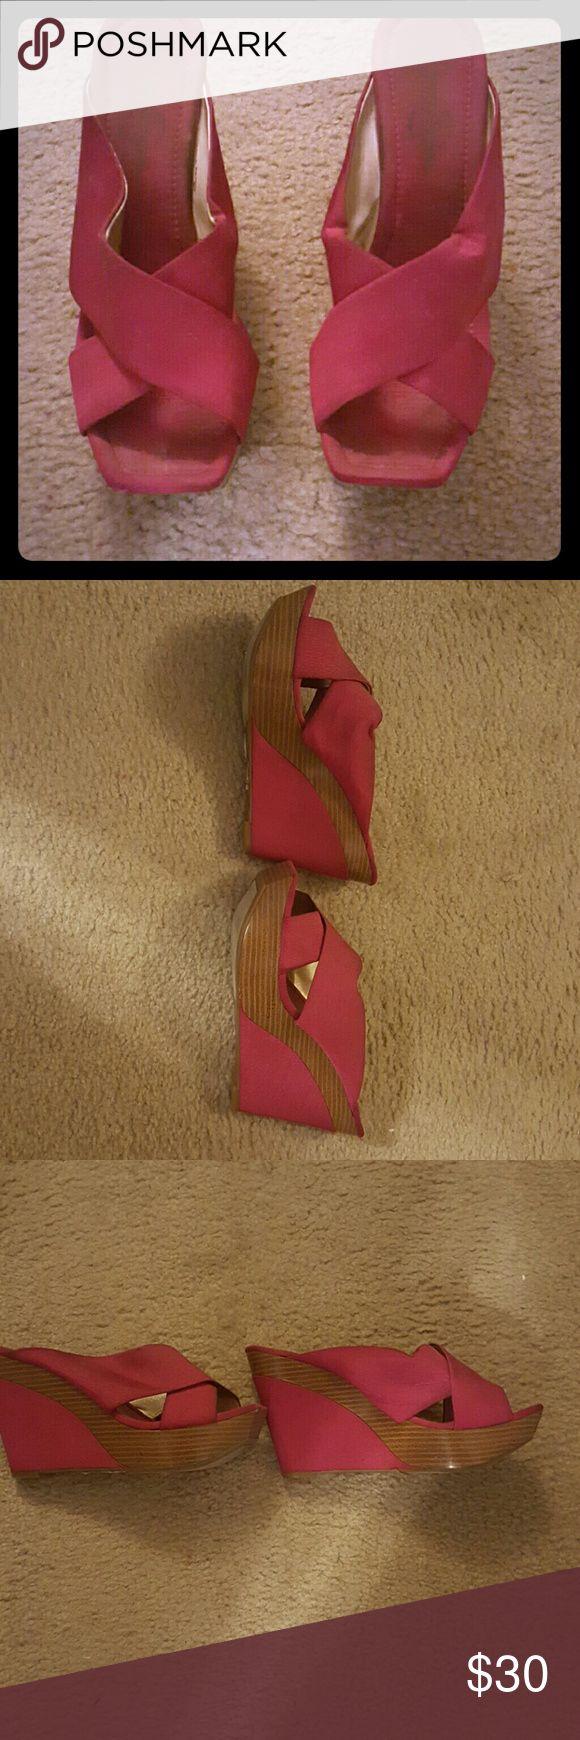 Fuchsia Jessica Simpson Sandal Jessica Simpson wedge sandal. Great shape. Very little wear. Jessica Simpson Shoes Sandals